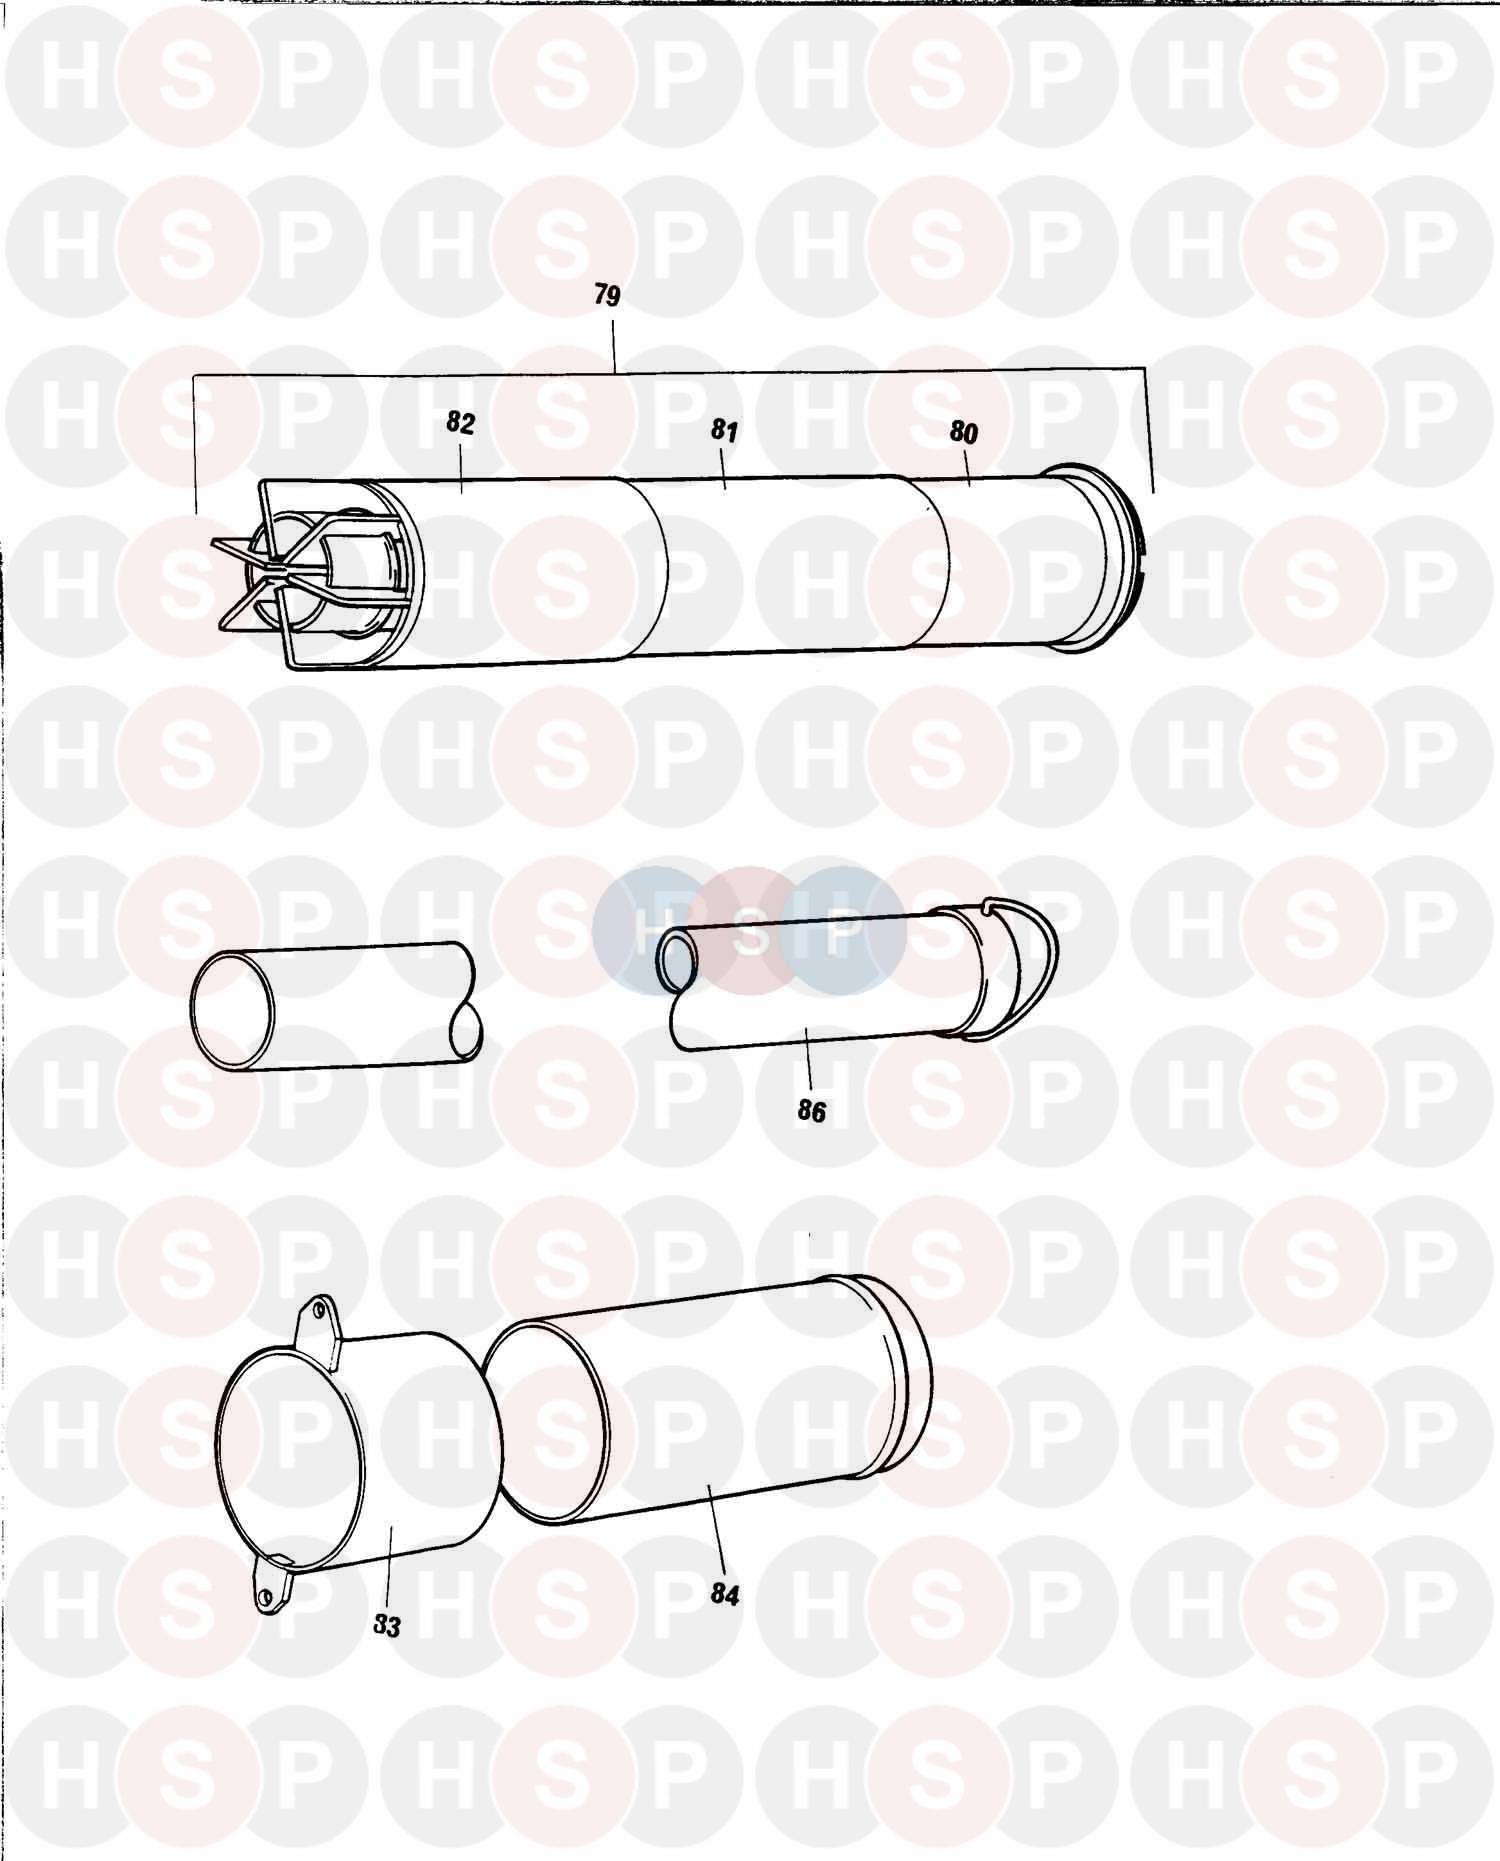 baxi solo 2 pf 50  flue  diagram